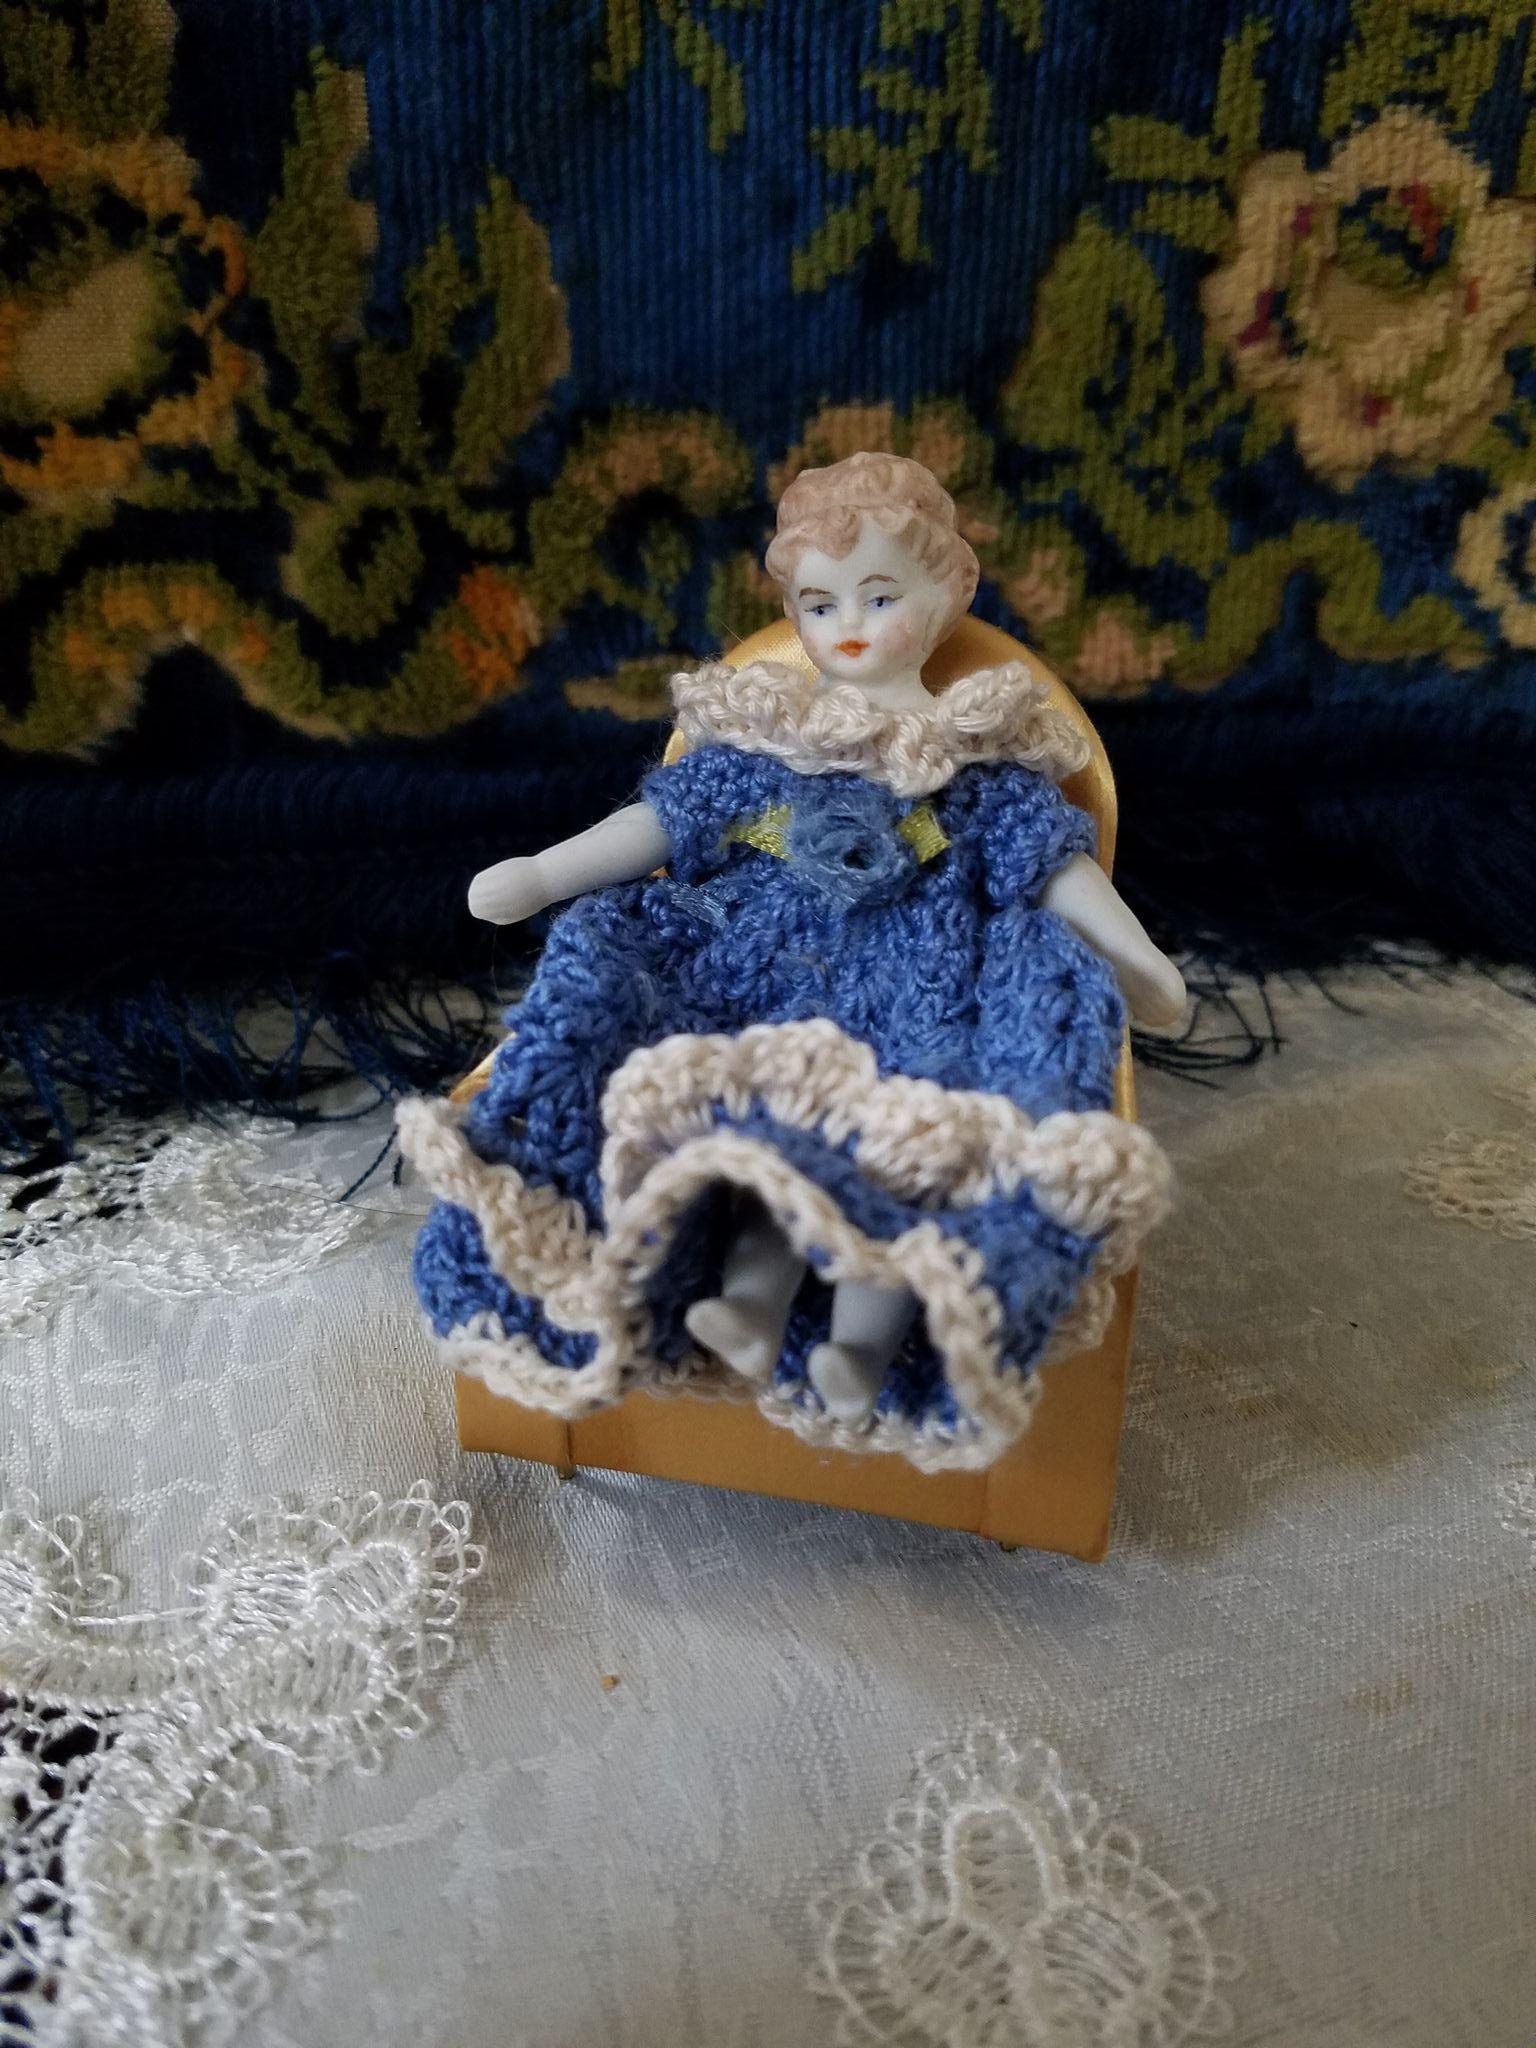 Vintage Bisque Dollhouse Doll